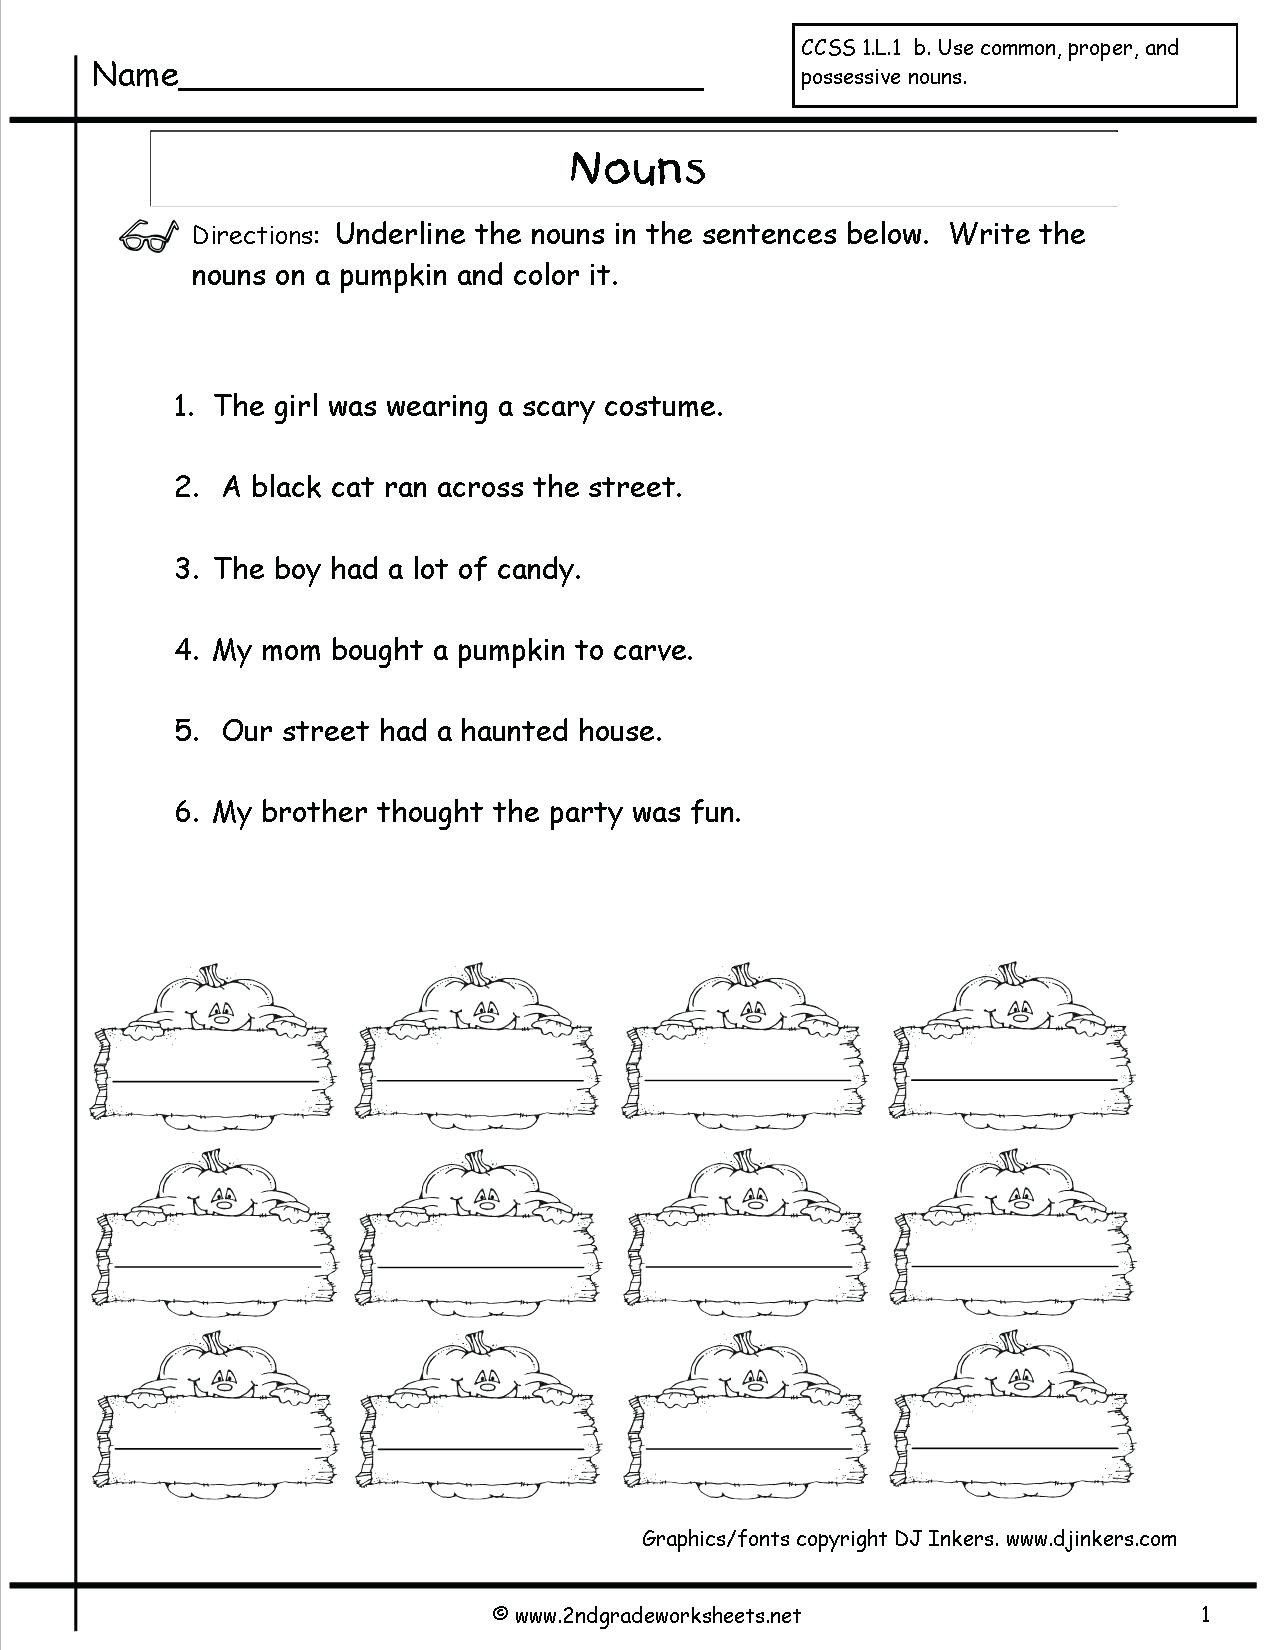 medium resolution of Grammar Worksheets Middle School Noun Worksheet Nouns Worksheet Grammar  Worksheets Middle   Nouns worksheet